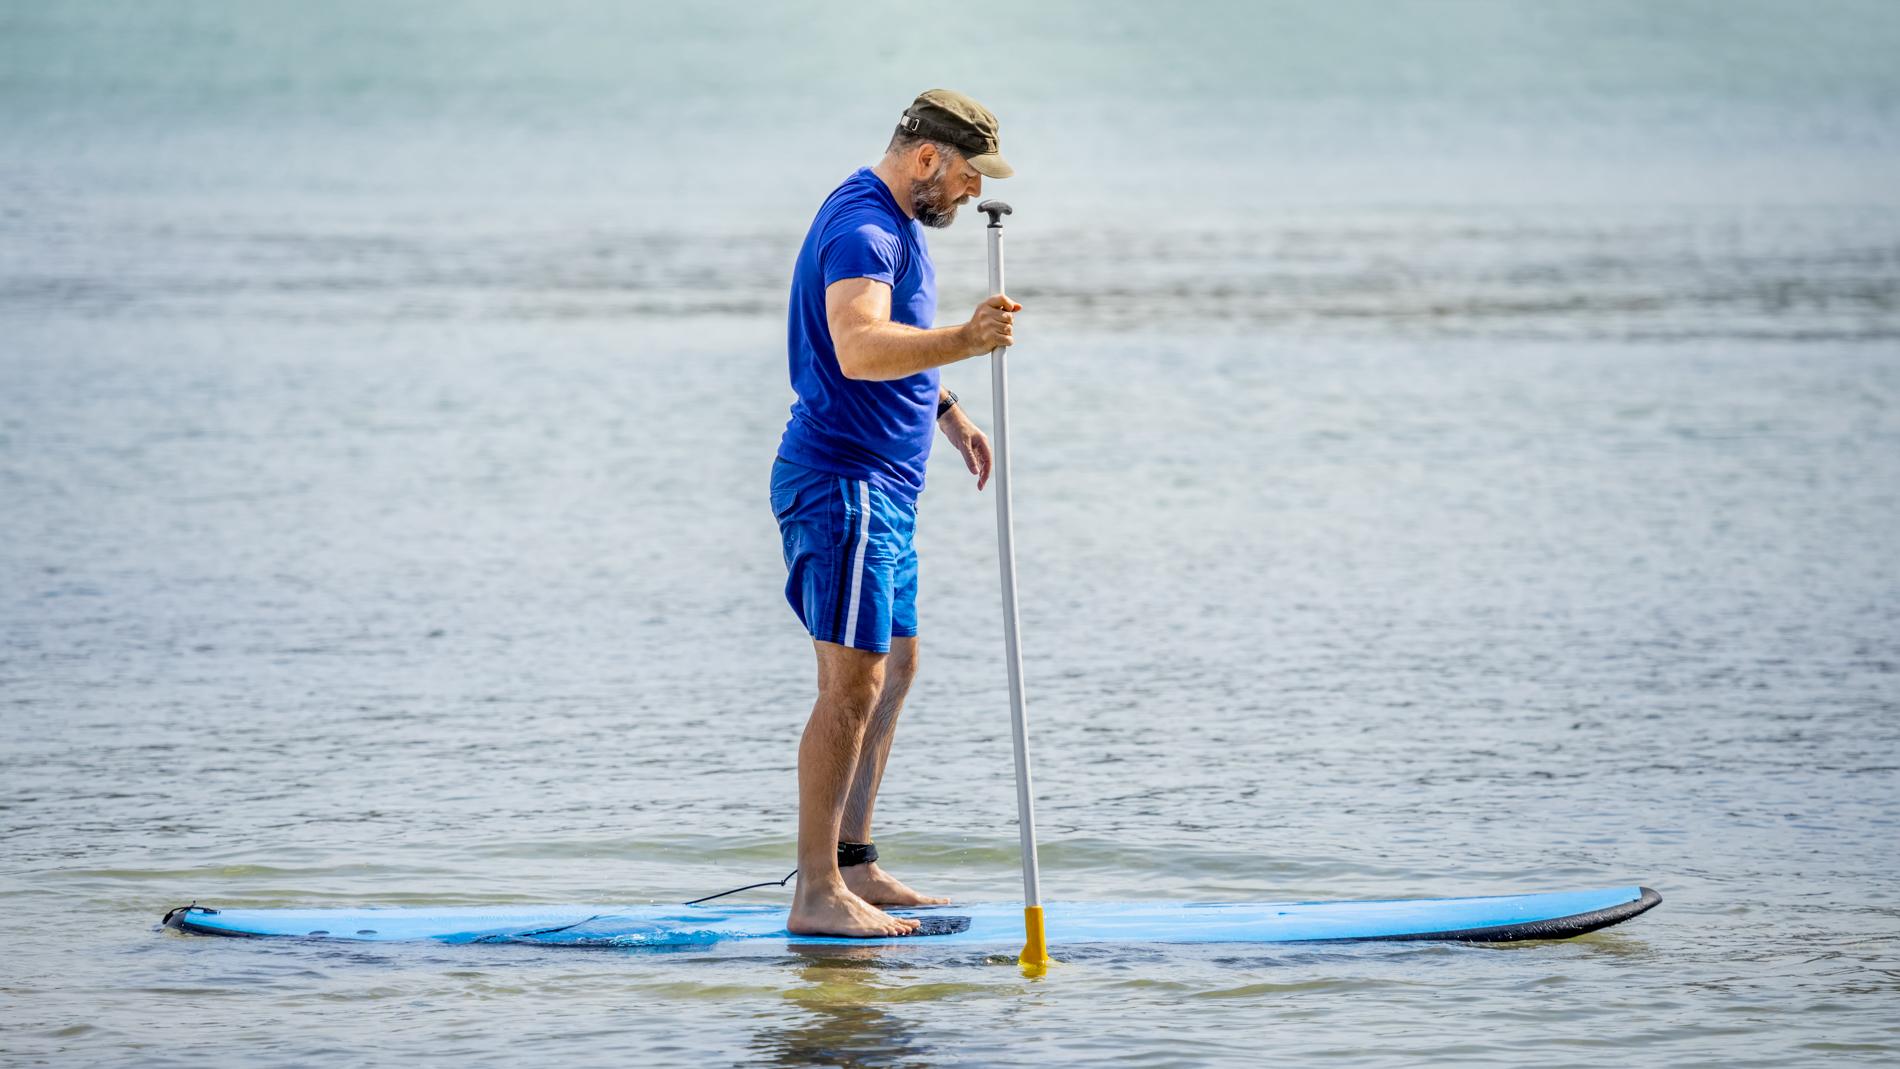 a-bearded-man-paddling-in-the-ocean-AQ2B63E.jpg